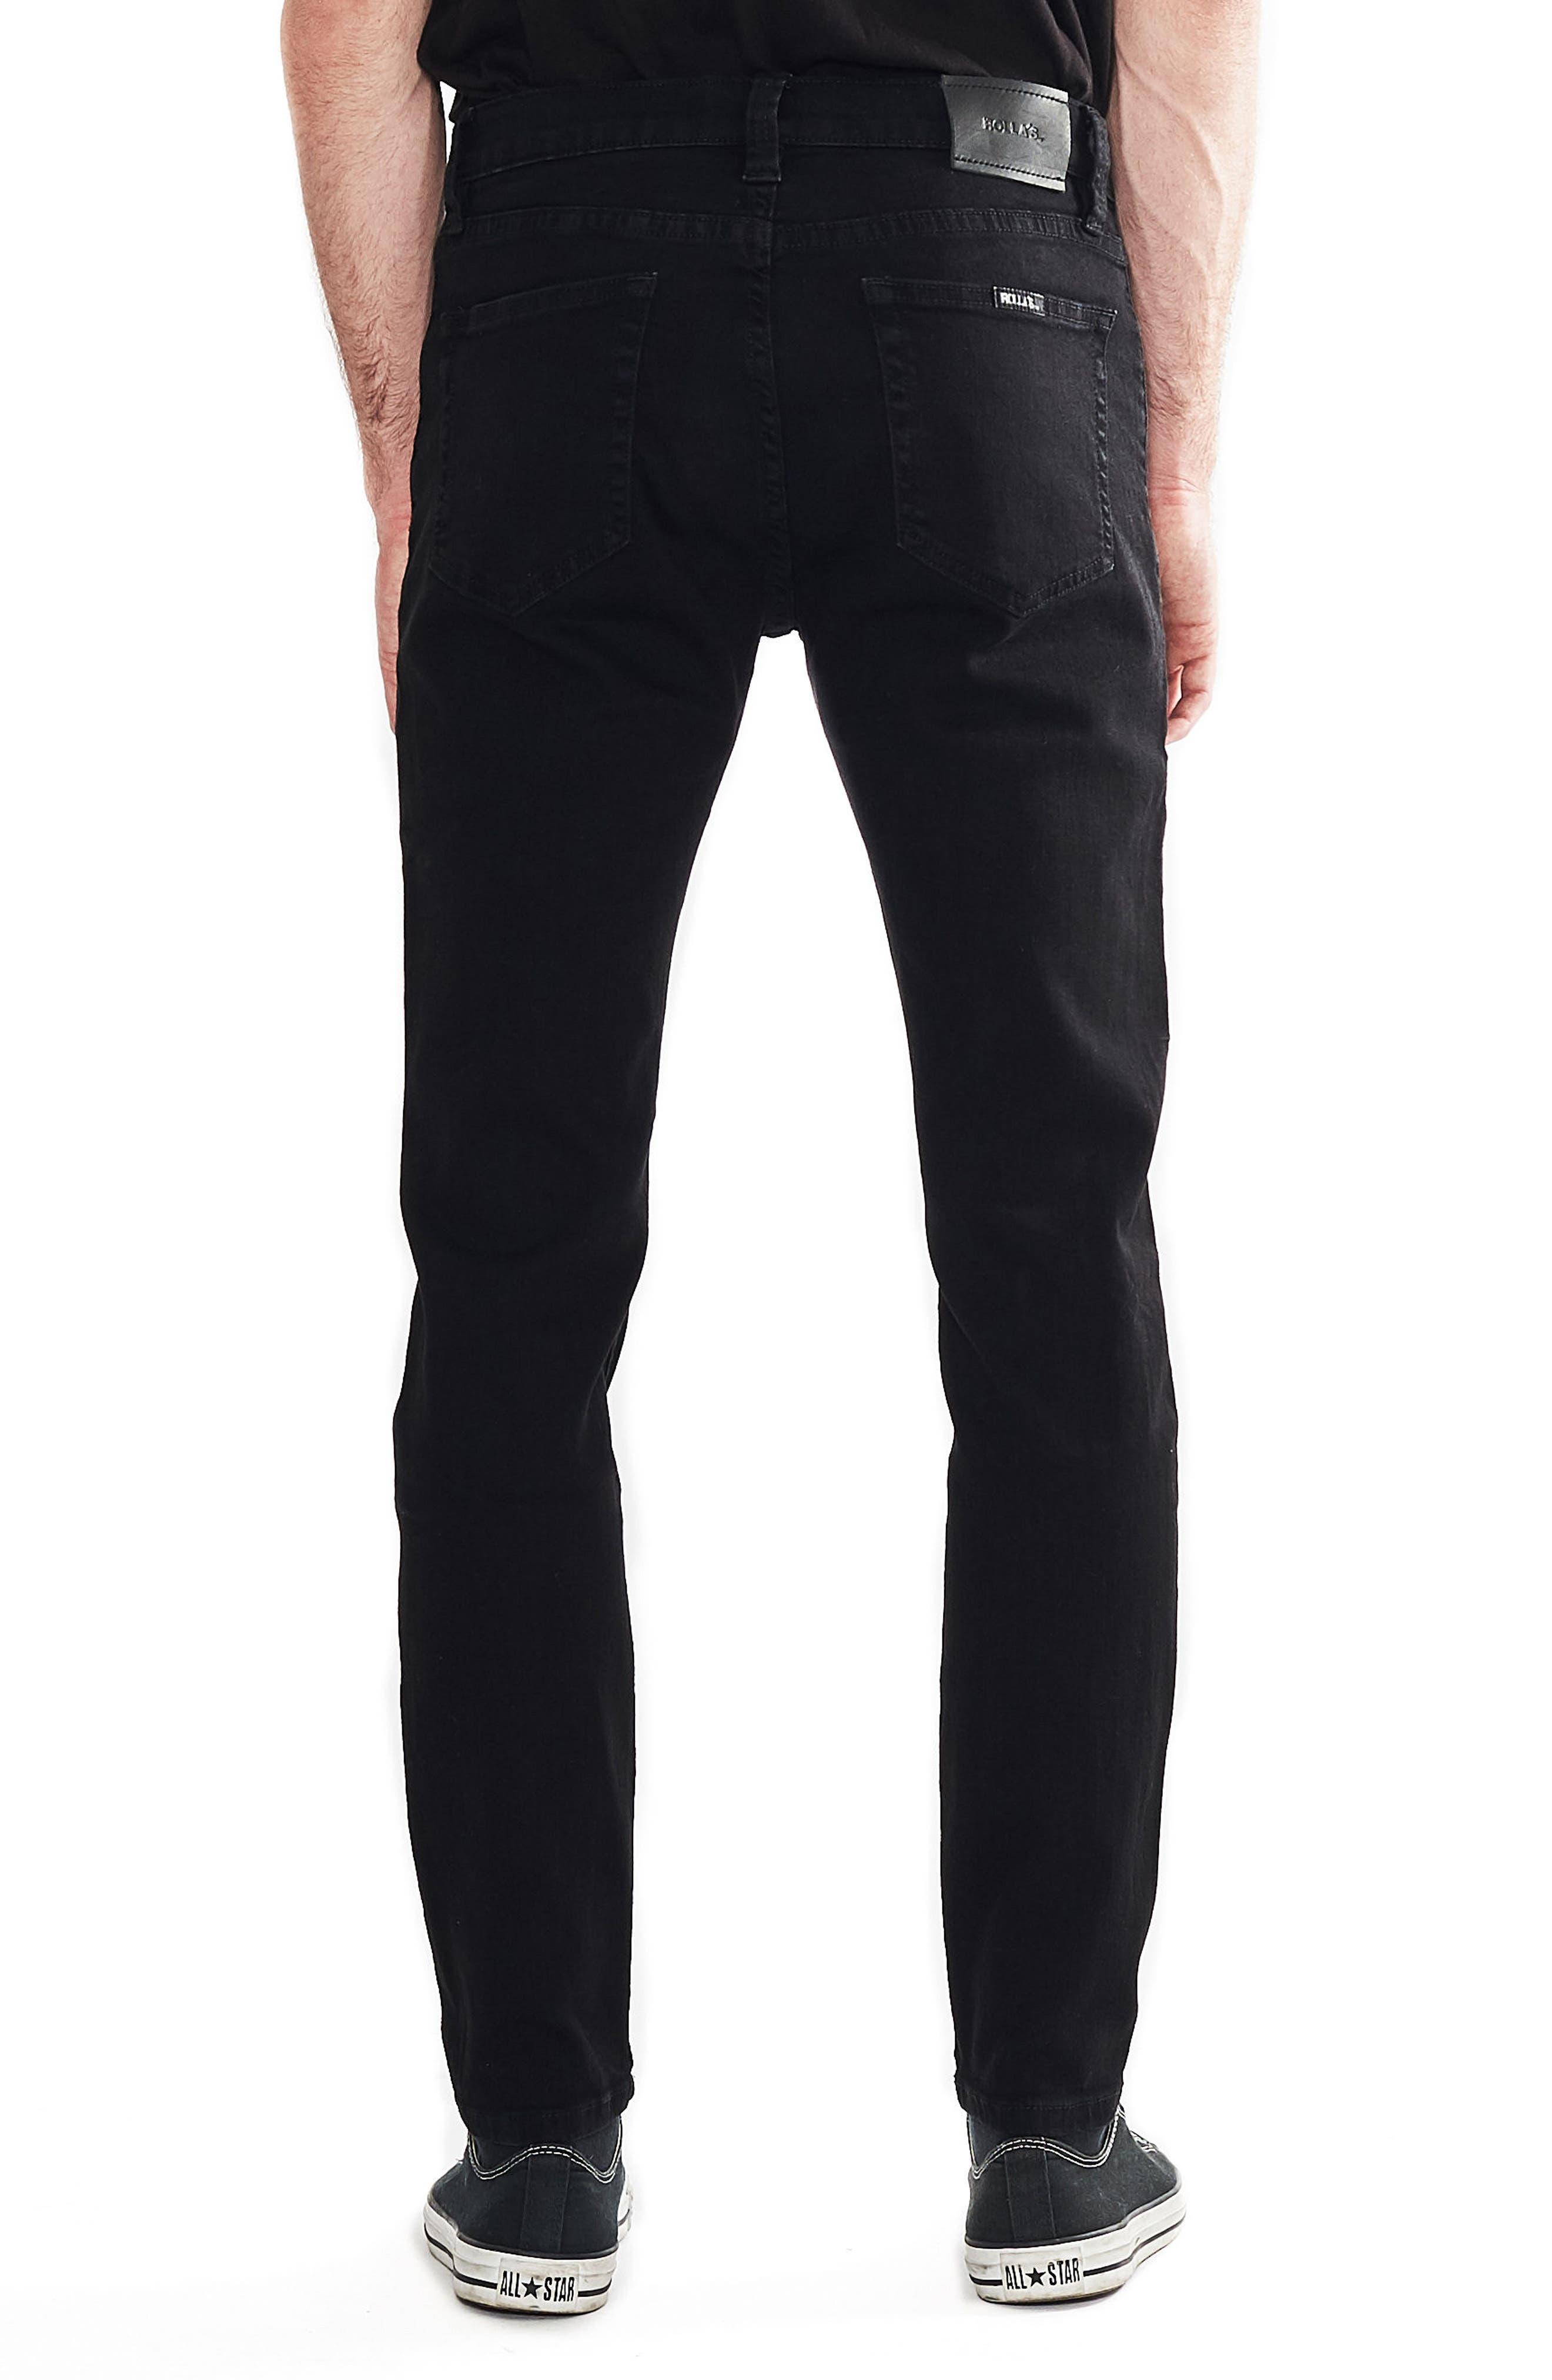 ROLLA'S,                             Stinger Skinny Fit Jeans,                             Alternate thumbnail 2, color,                             BLACK GOLD